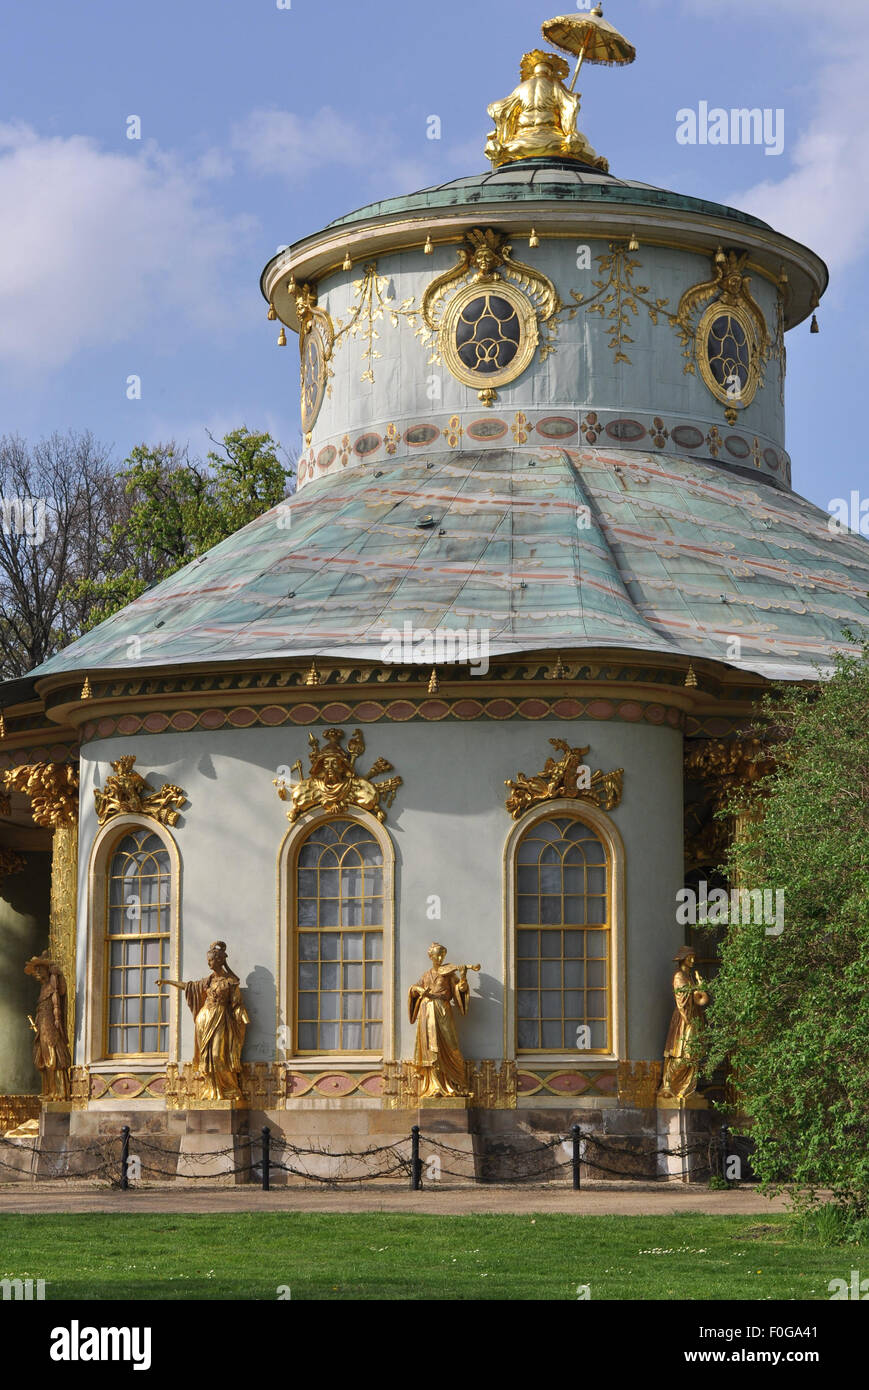 Chinese House, Potsdam Sanssouci, 18th century, Brandenburg, Germany - Stock Image